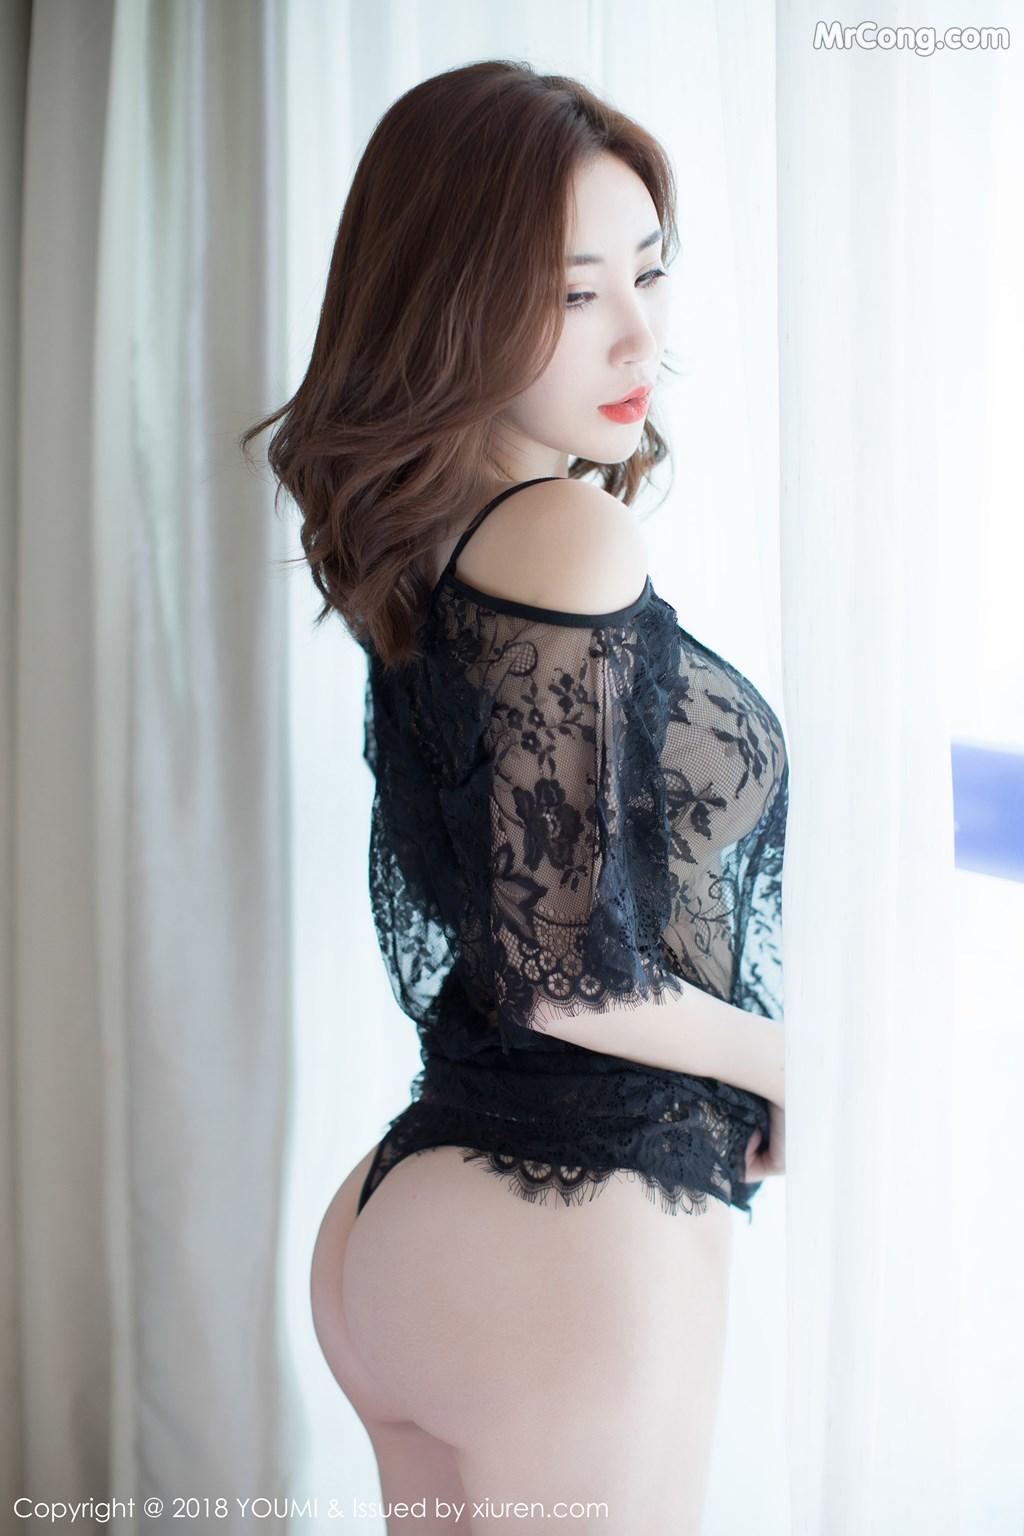 Image YouMi-Vol.219-Sun-Meng-Yao-V-MrCong.com-002 in post YouMi Vol.219: Người mẫu Sun Meng Yao (孙梦瑶V) (48 ảnh)